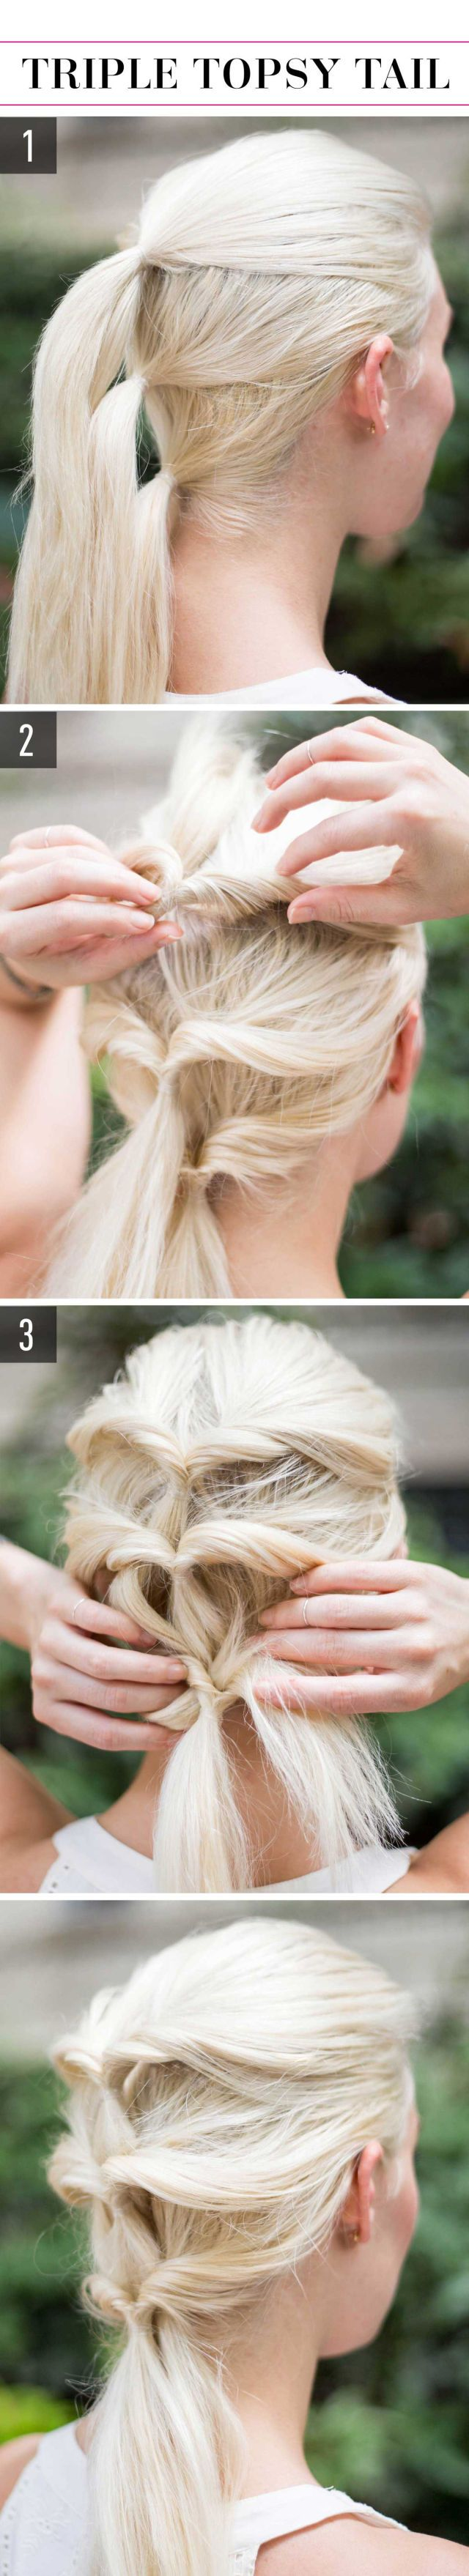 best beautyhair hacks images on pinterest beauty tips beauty